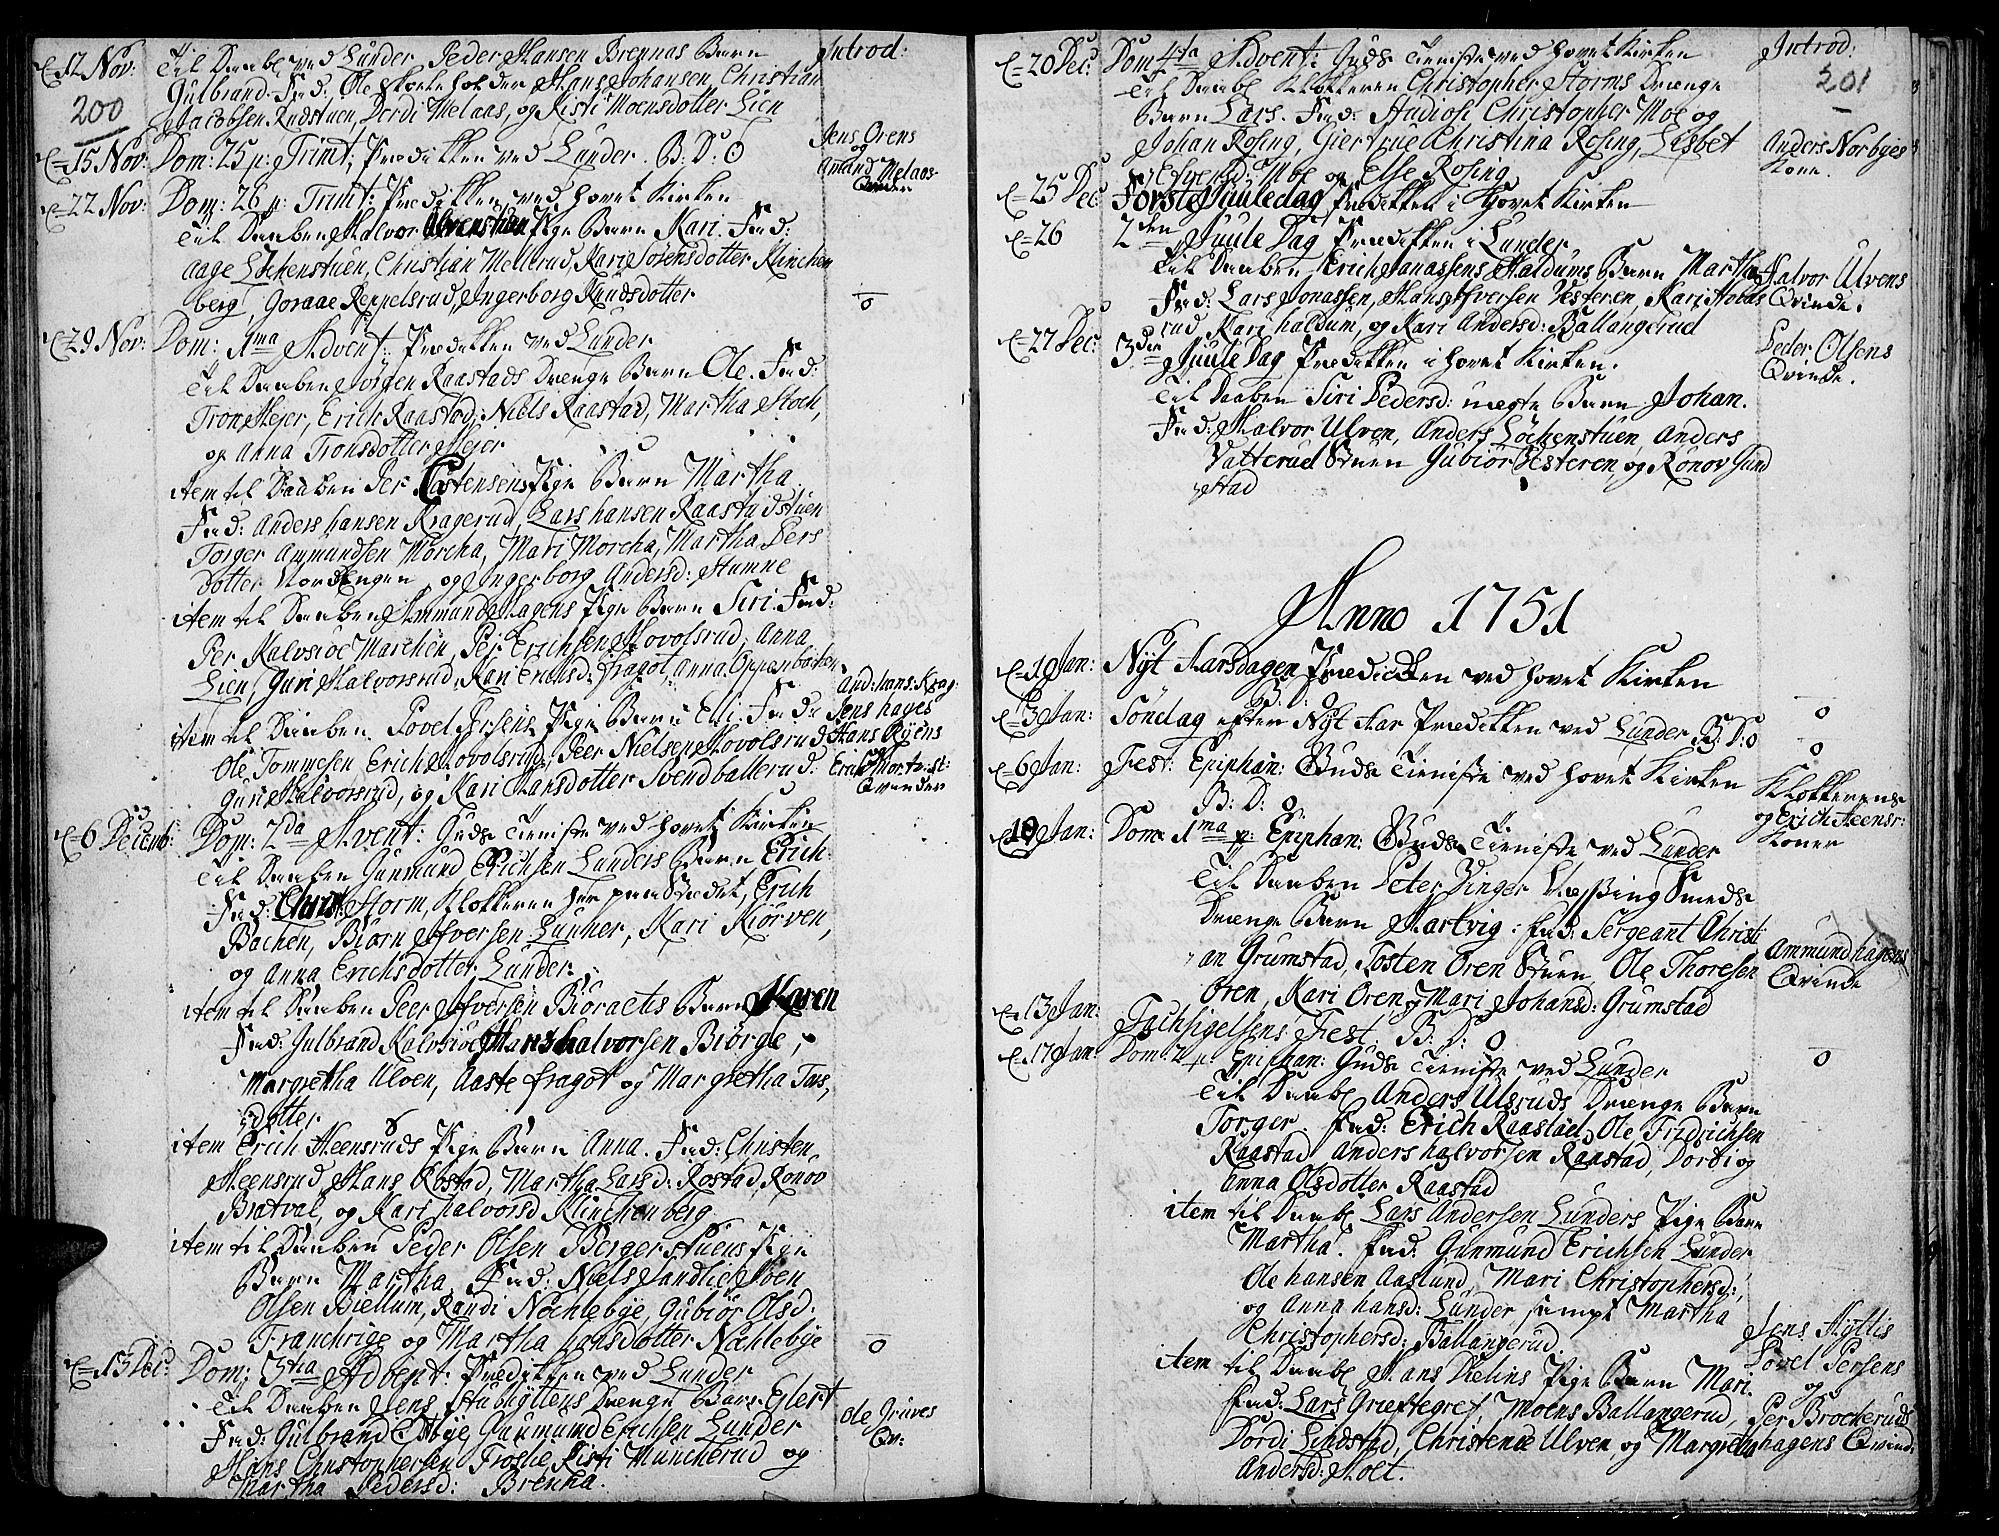 SAH, Jevnaker prestekontor, Ministerialbok nr. 2, 1725-1751, s. 200-201